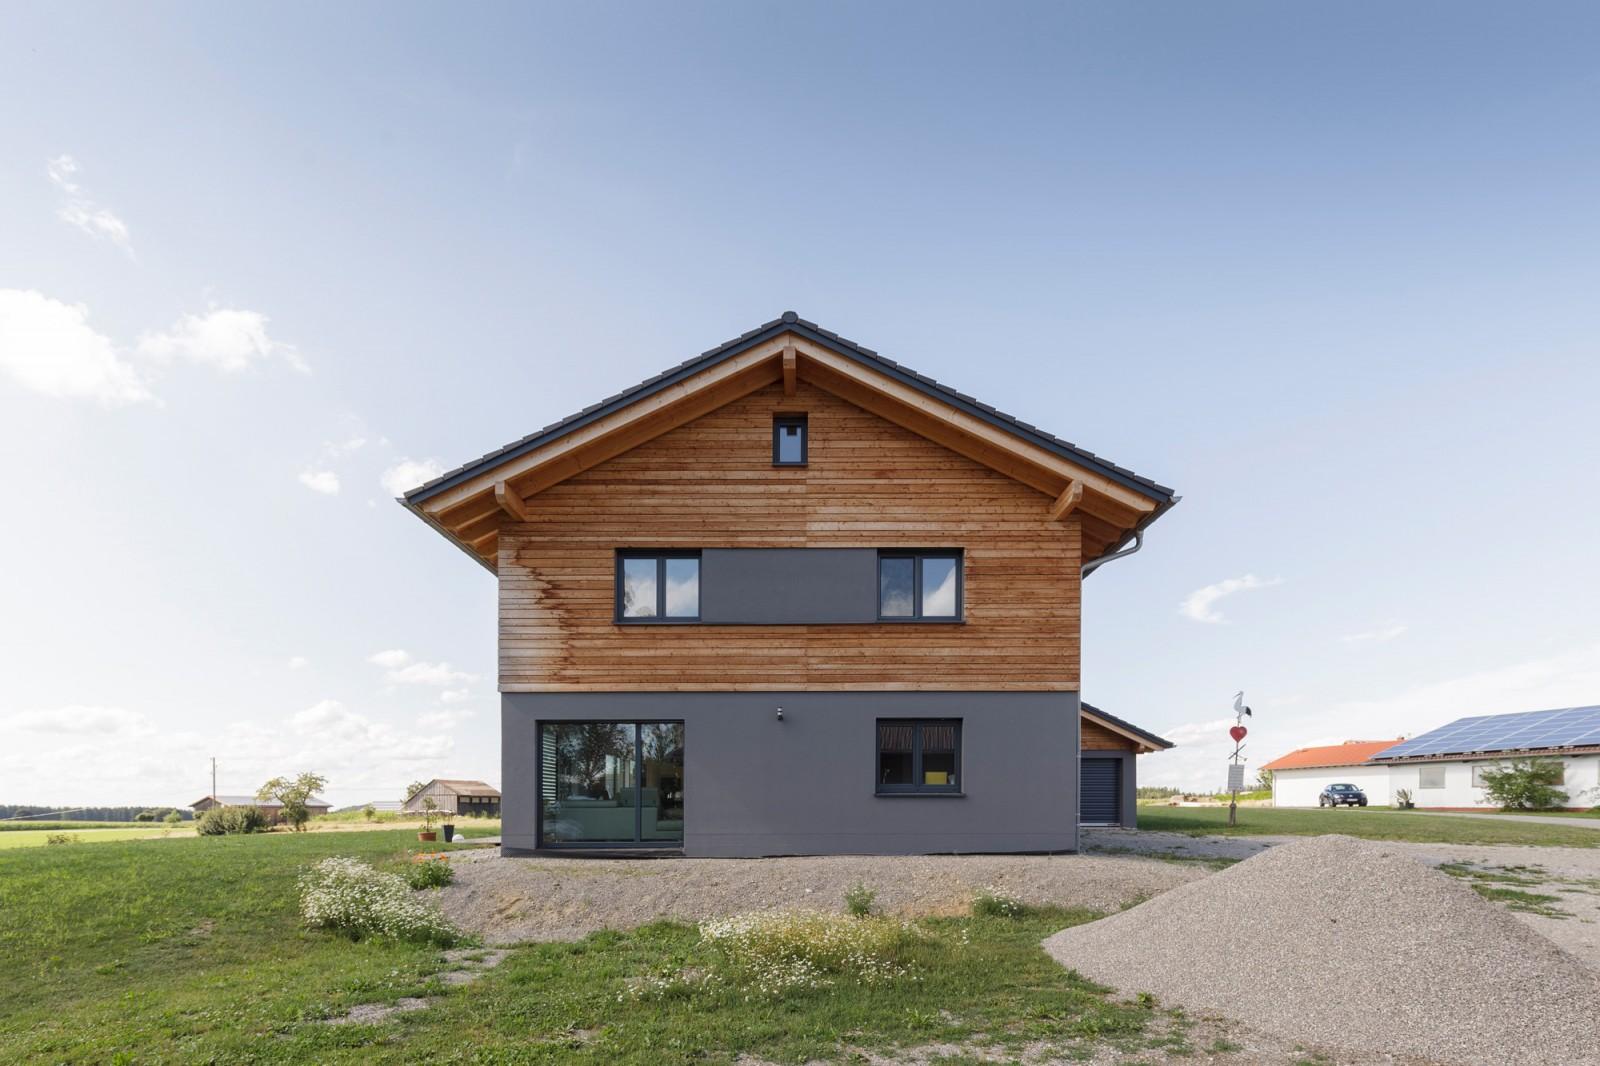 Haus mit MHM-Massiv-Holz-Mauer